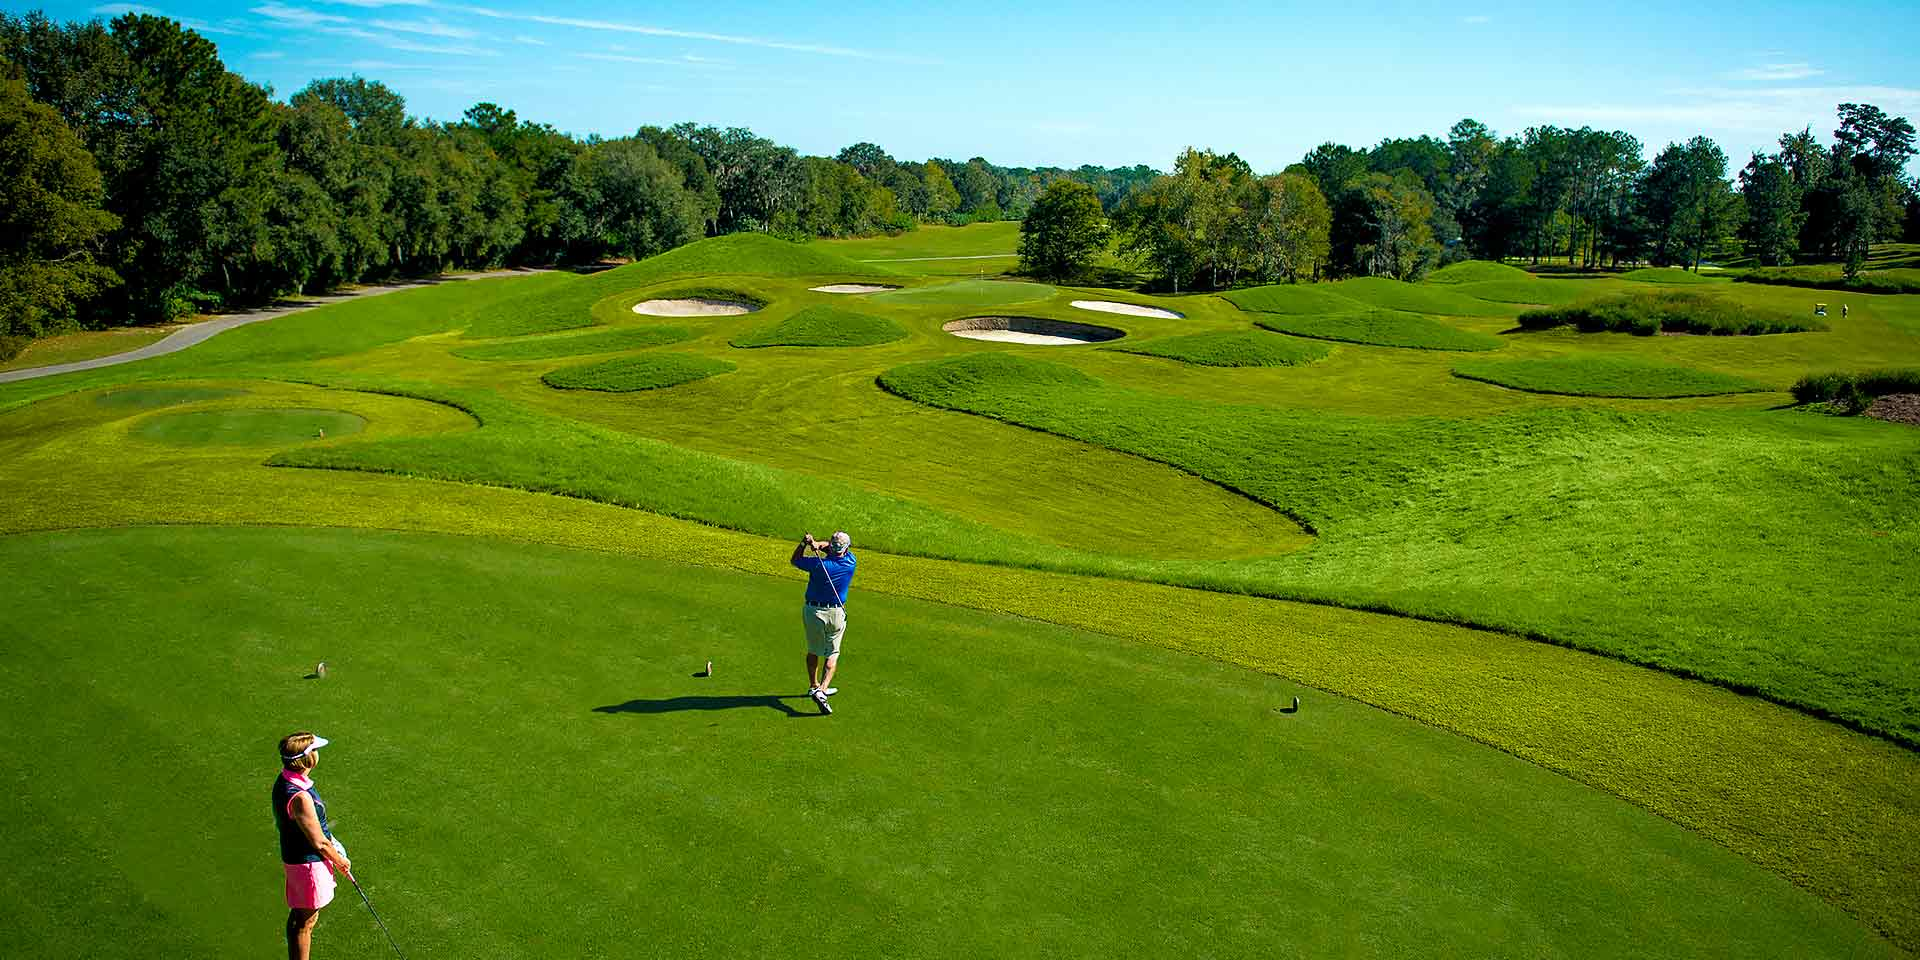 Golfing at Golden Ocala